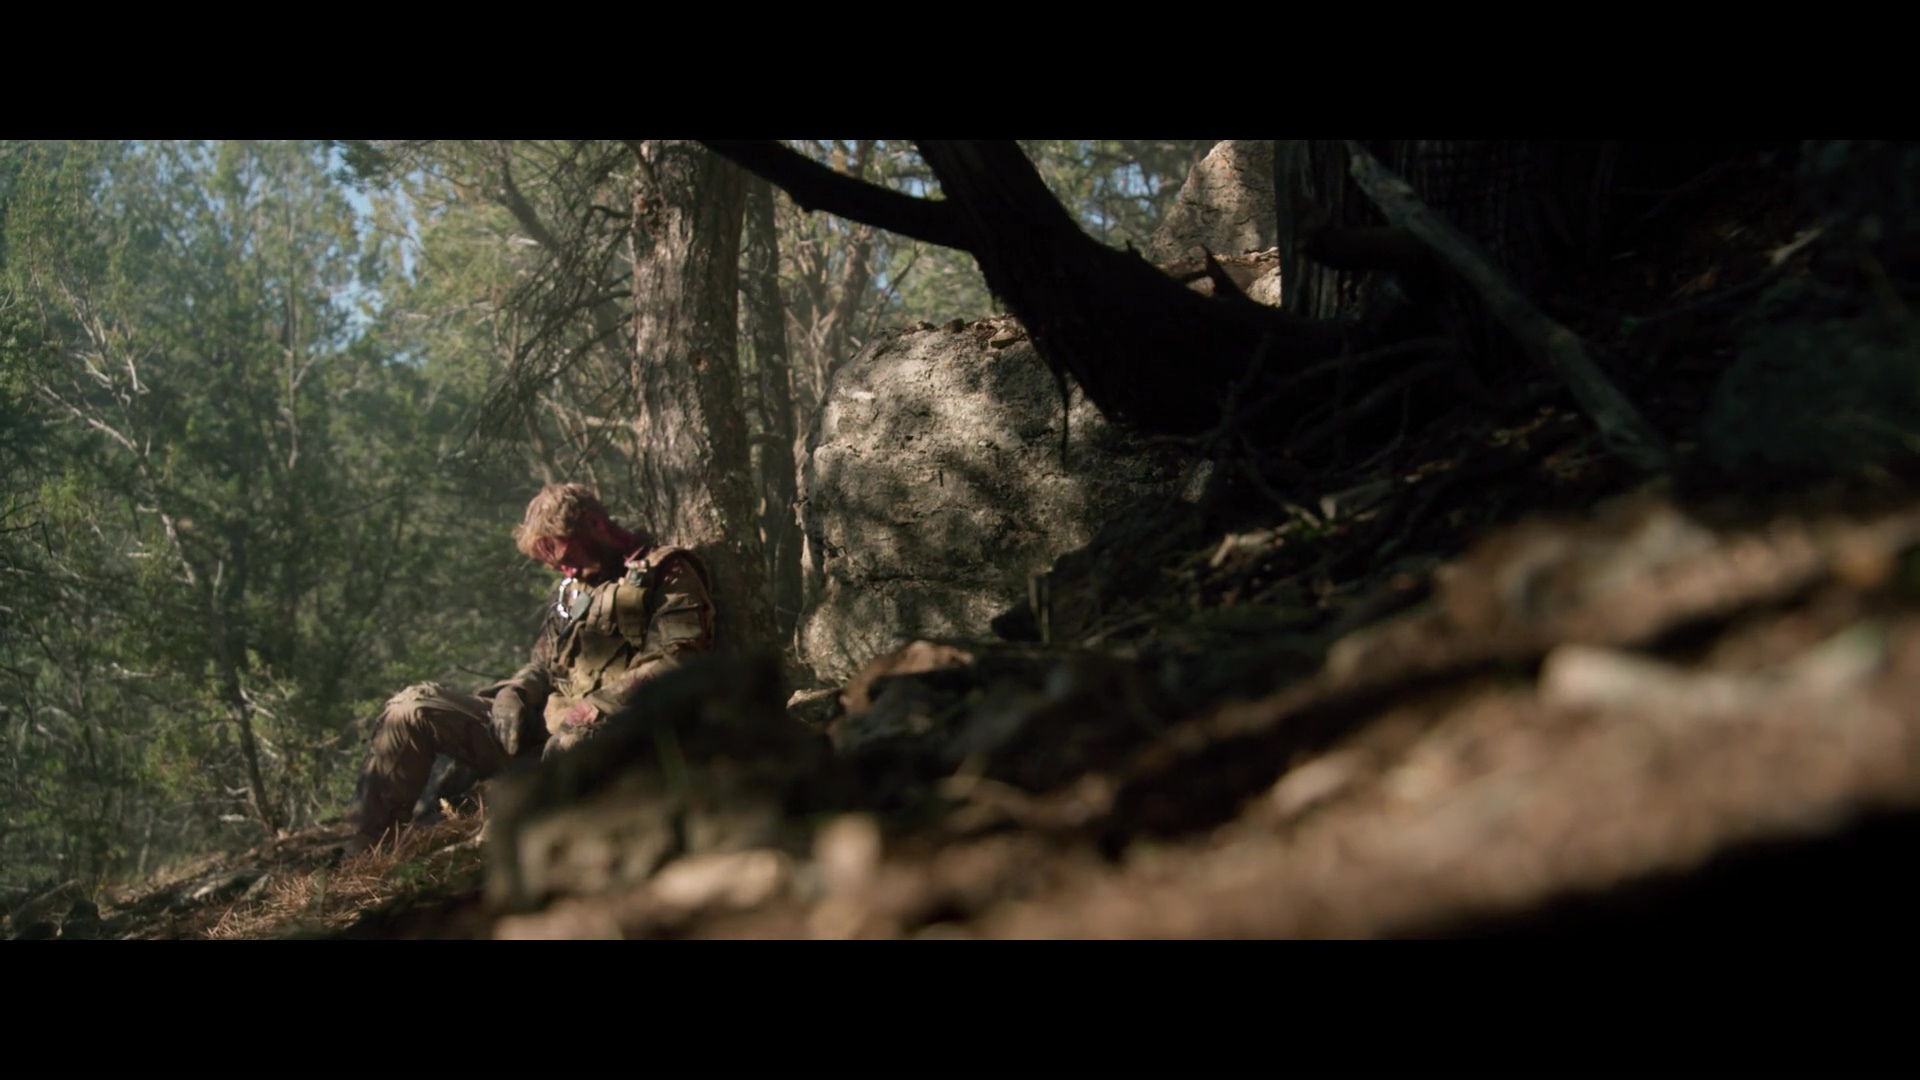 El Superviviente 1080p Lat-Cast-Ing[Belico](2013)